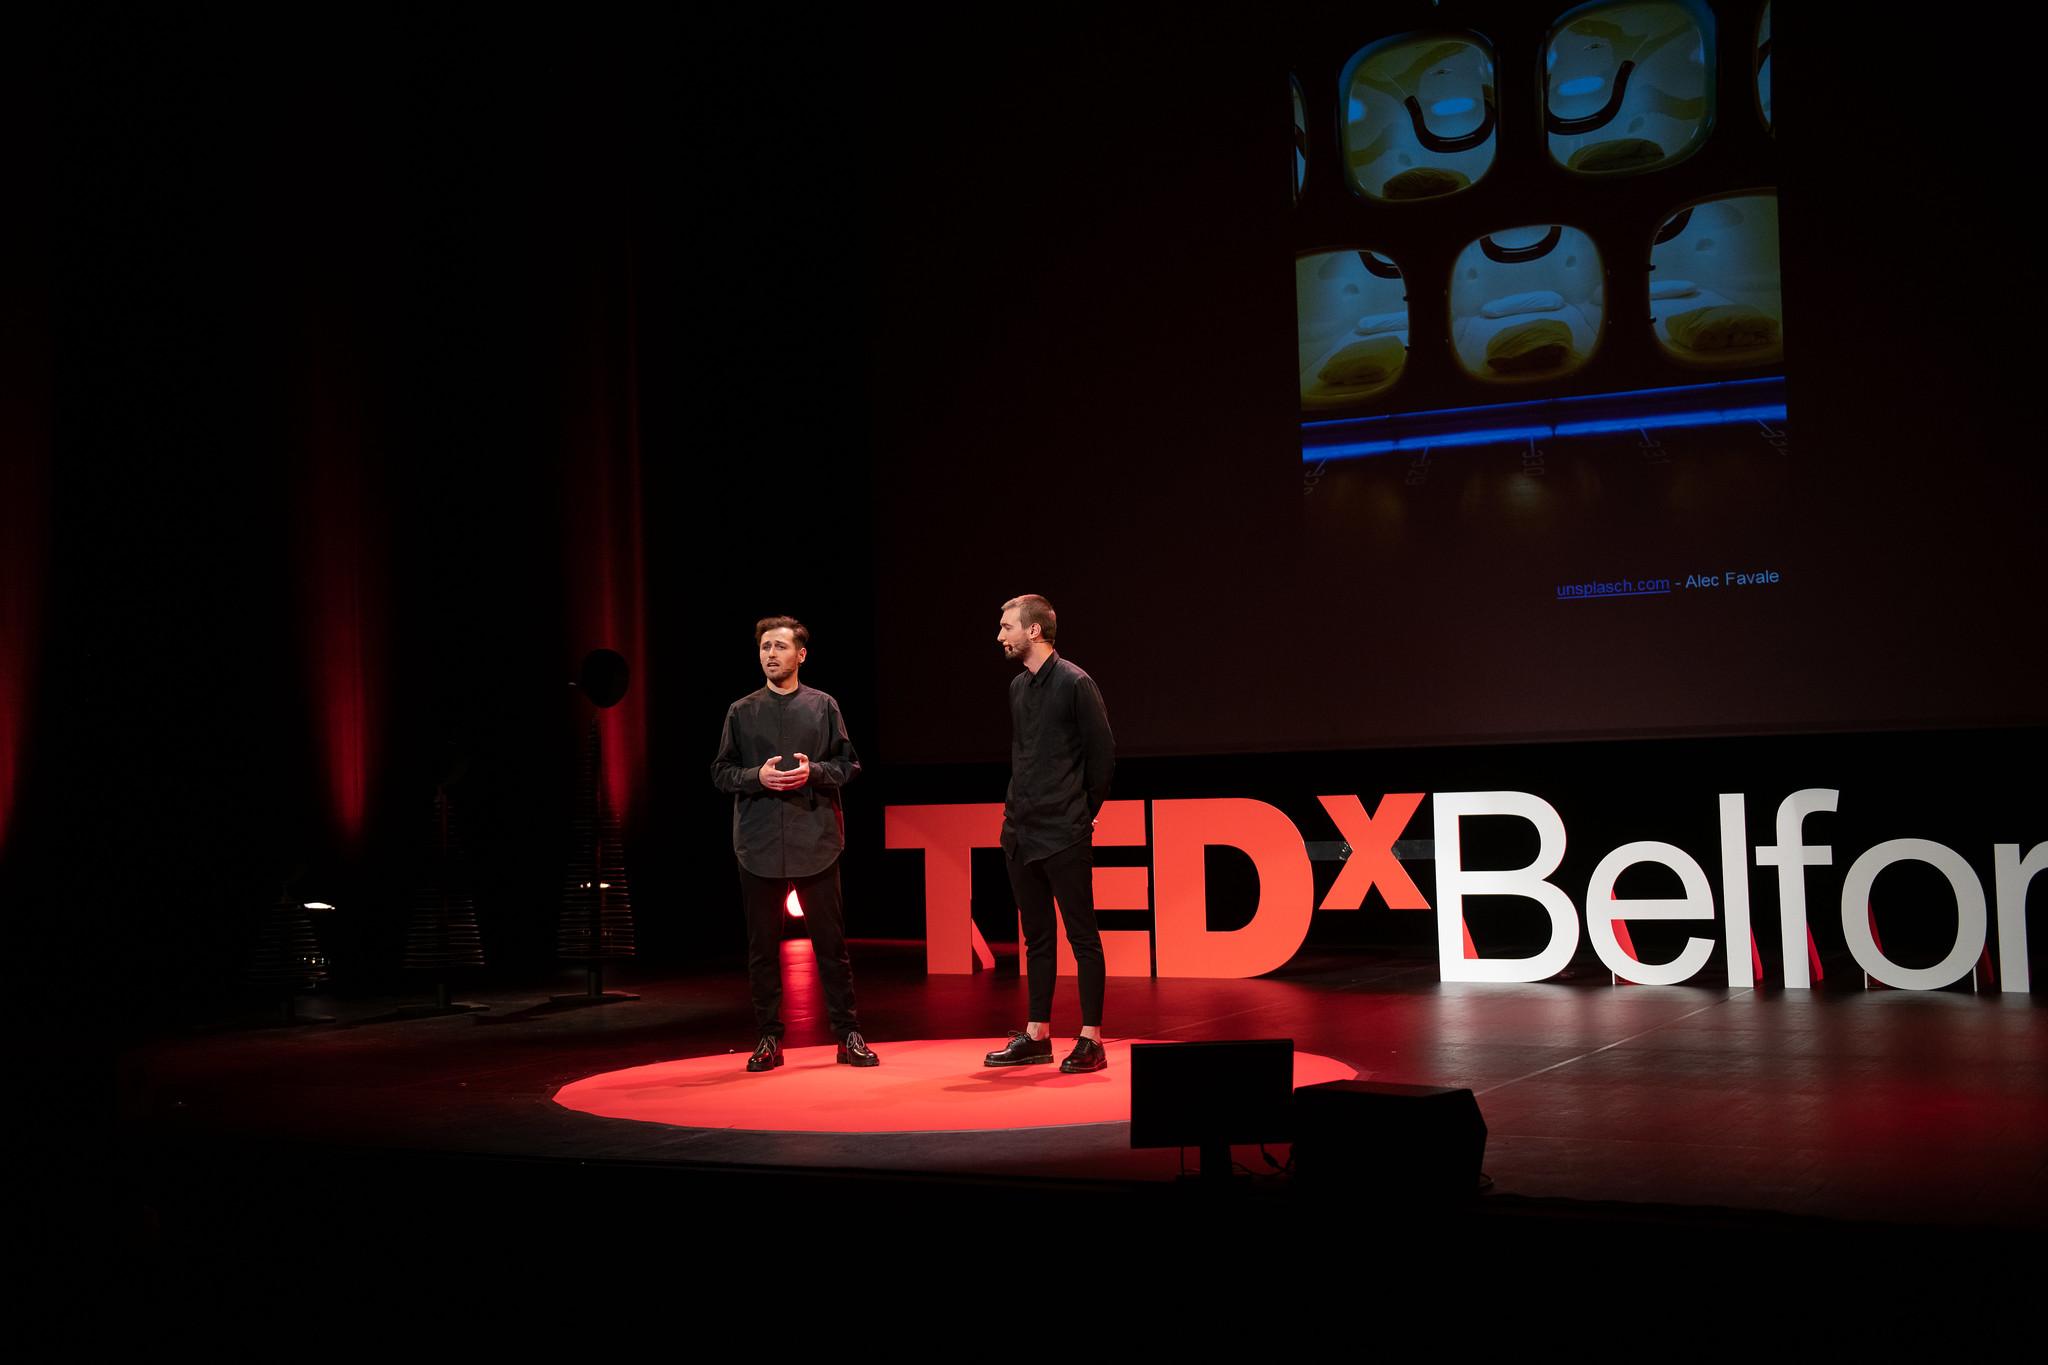 Tedx-belfort-sur-scene-speech-architecture